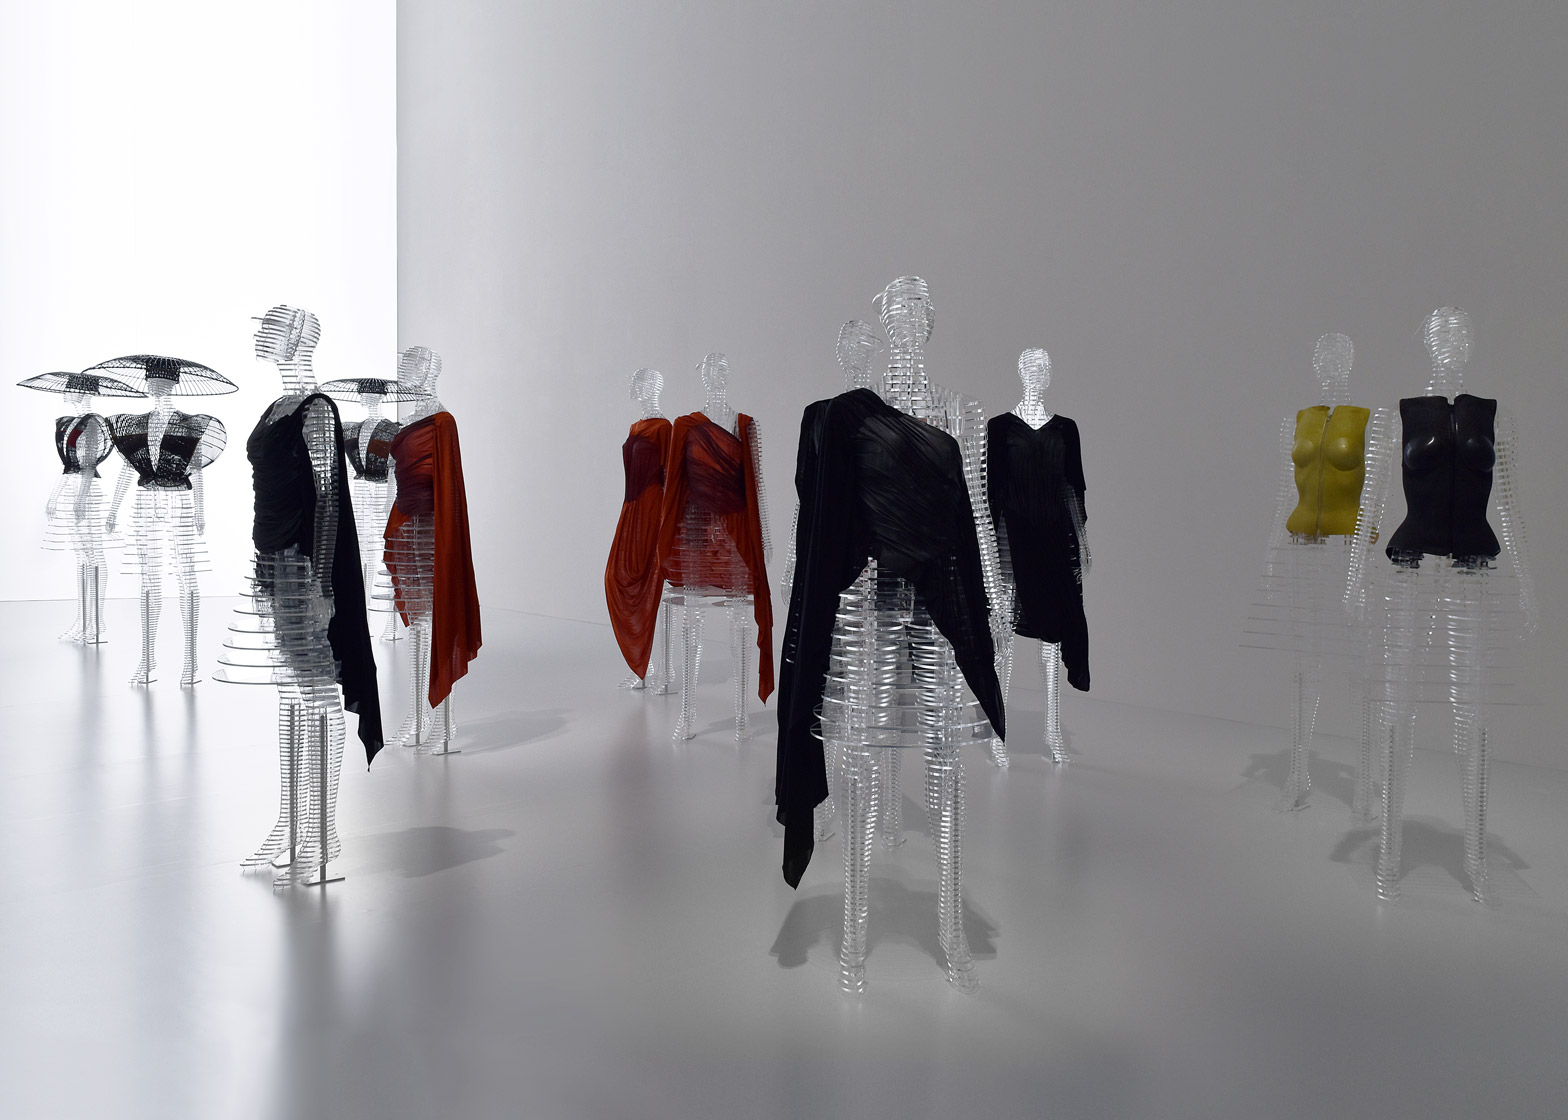 transparent-body-installation-tokujin-yoshioka-issey-miyake-exhibition-tokyp-japan_dezeen_1568_8.jpg